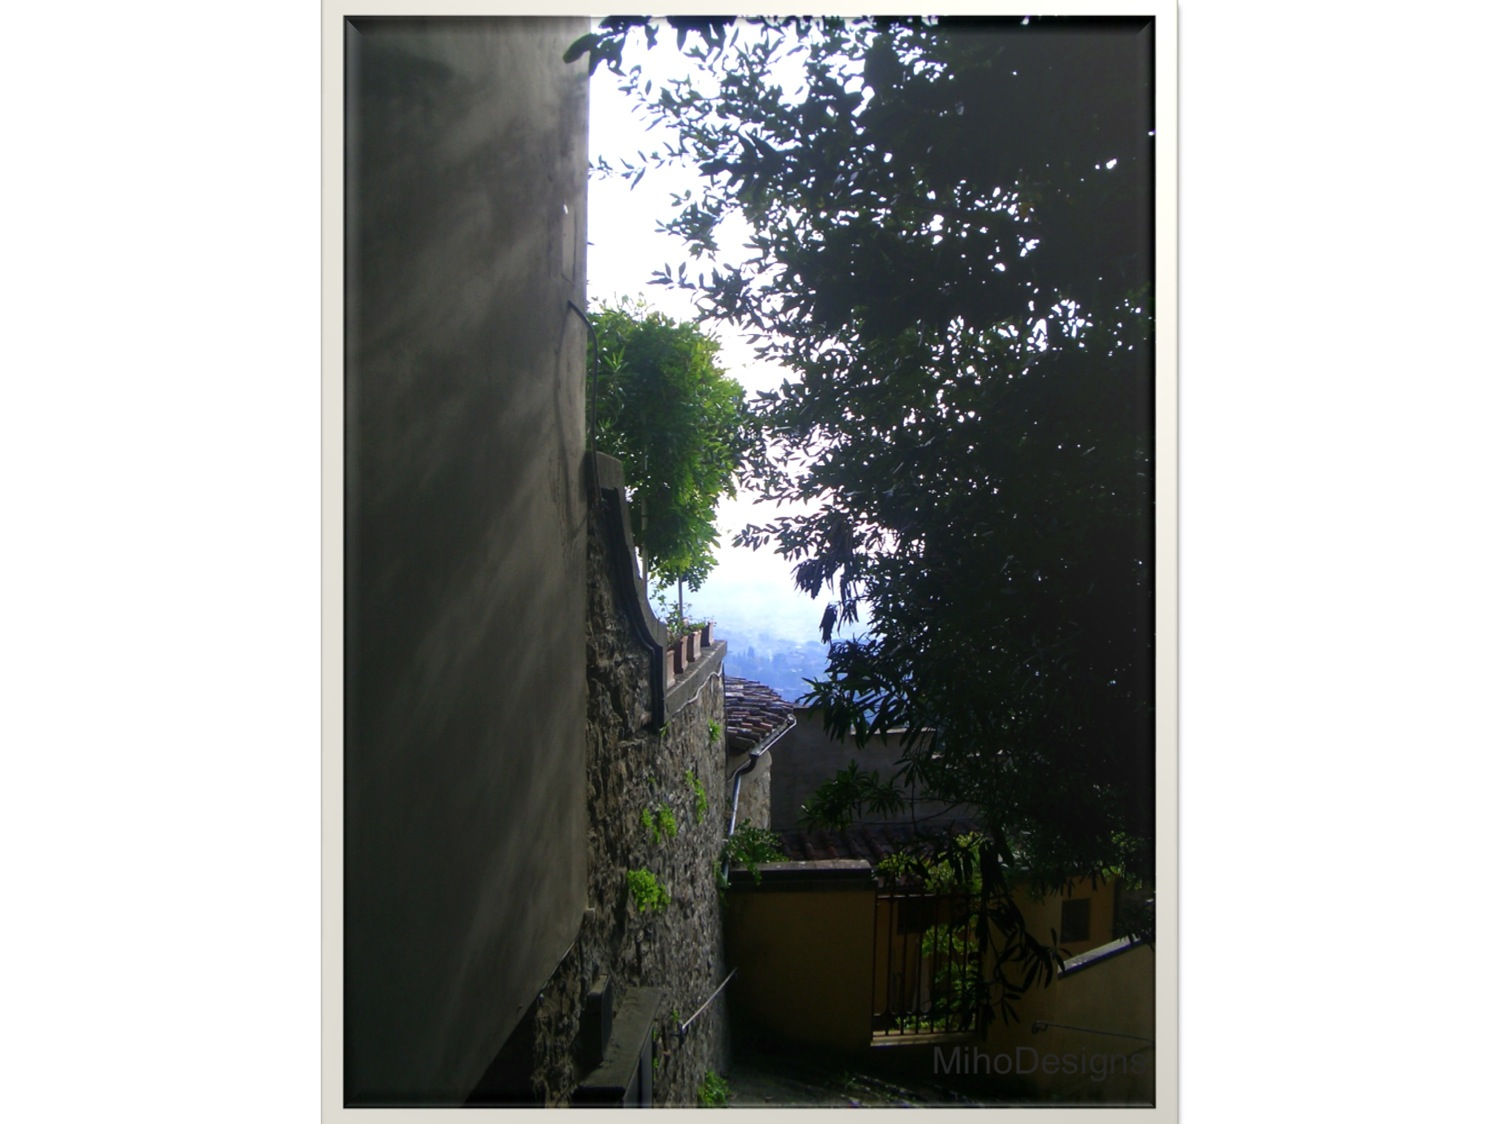 c0293449_17363514.jpg